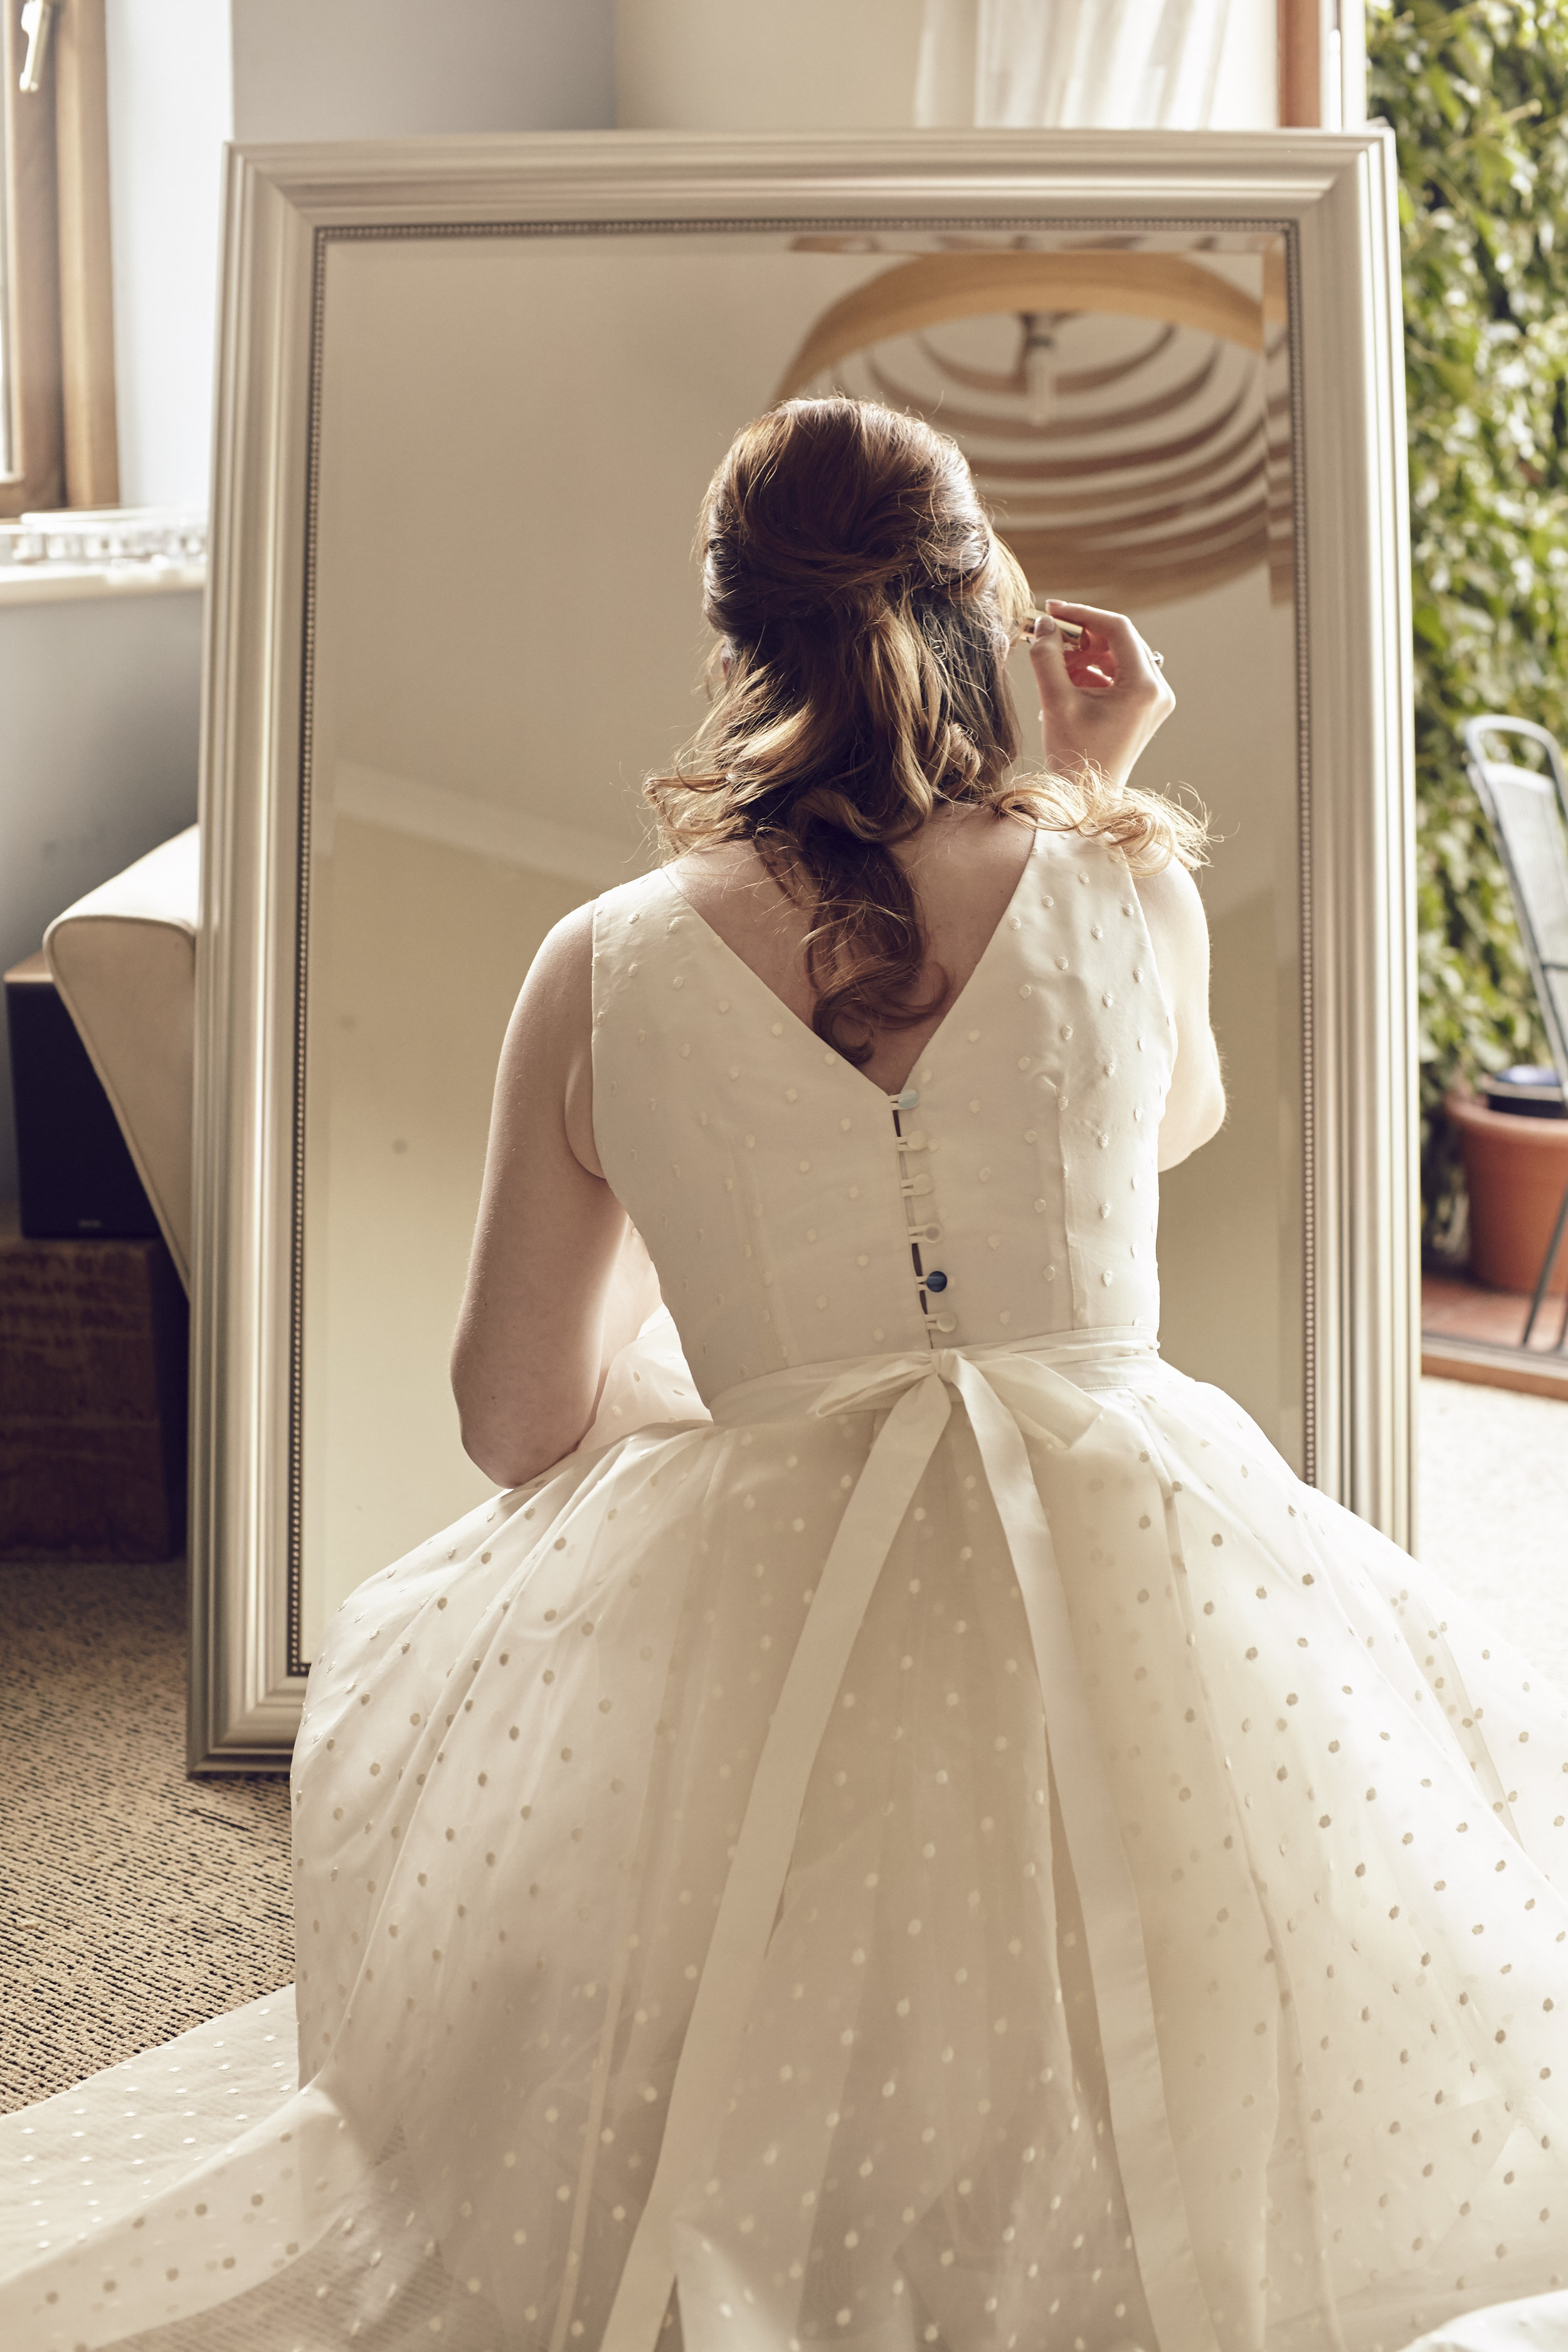 Suzi-Matlock-Polka-Dot-Bespoke-Wedding-Dress-High-Low-Susanna-Greening-Designs-Derbyshire-3